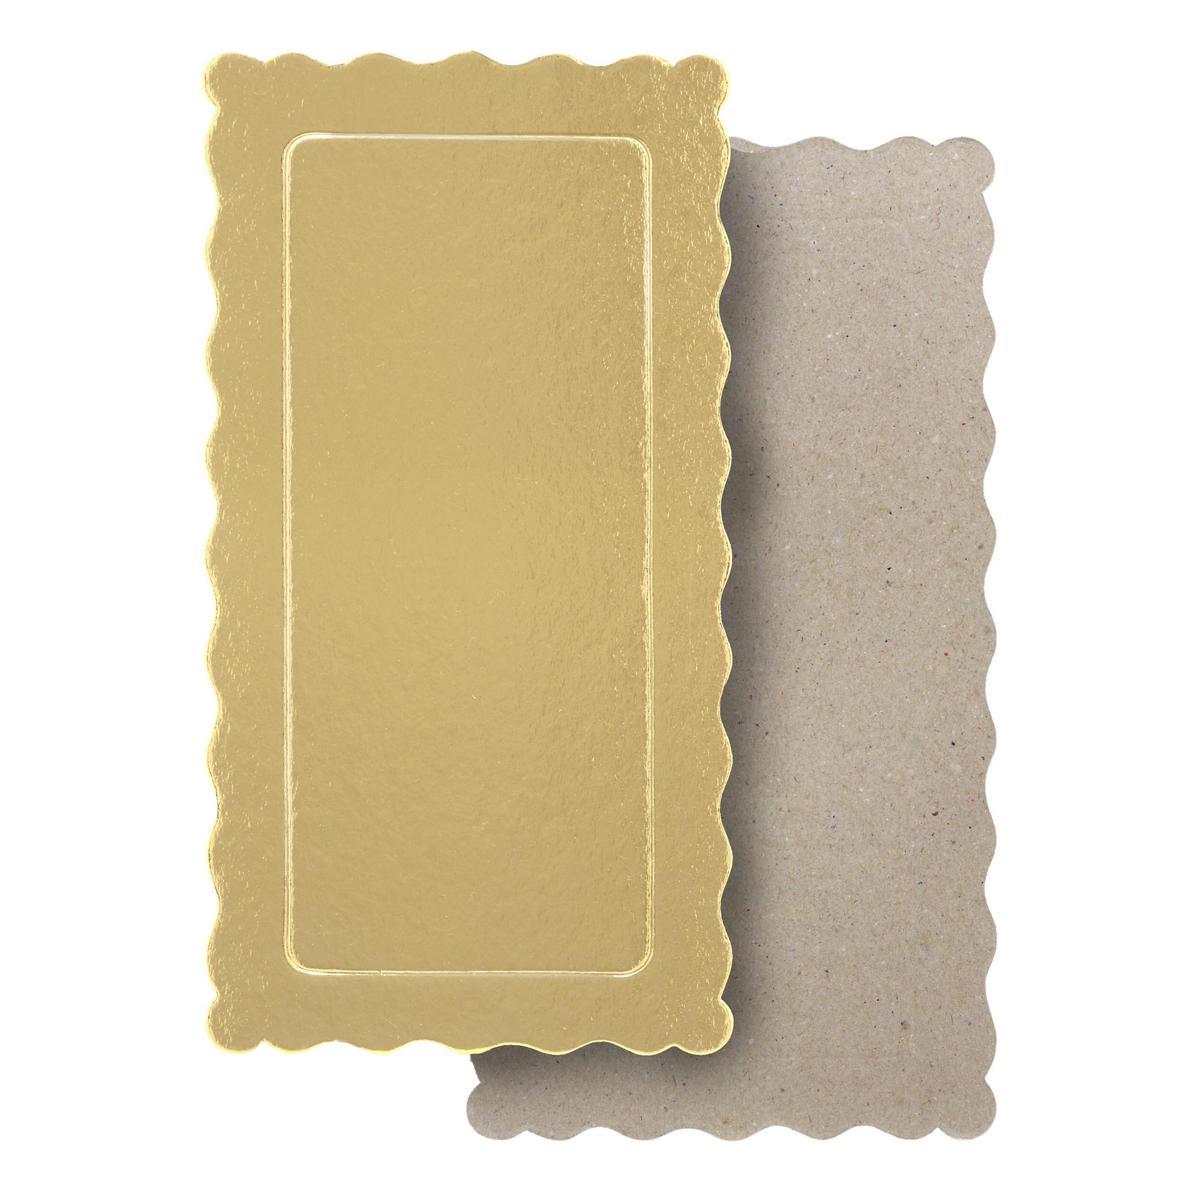 100 Bases Laminadas Para Bolo Retangular, Cake Board 29x15cm